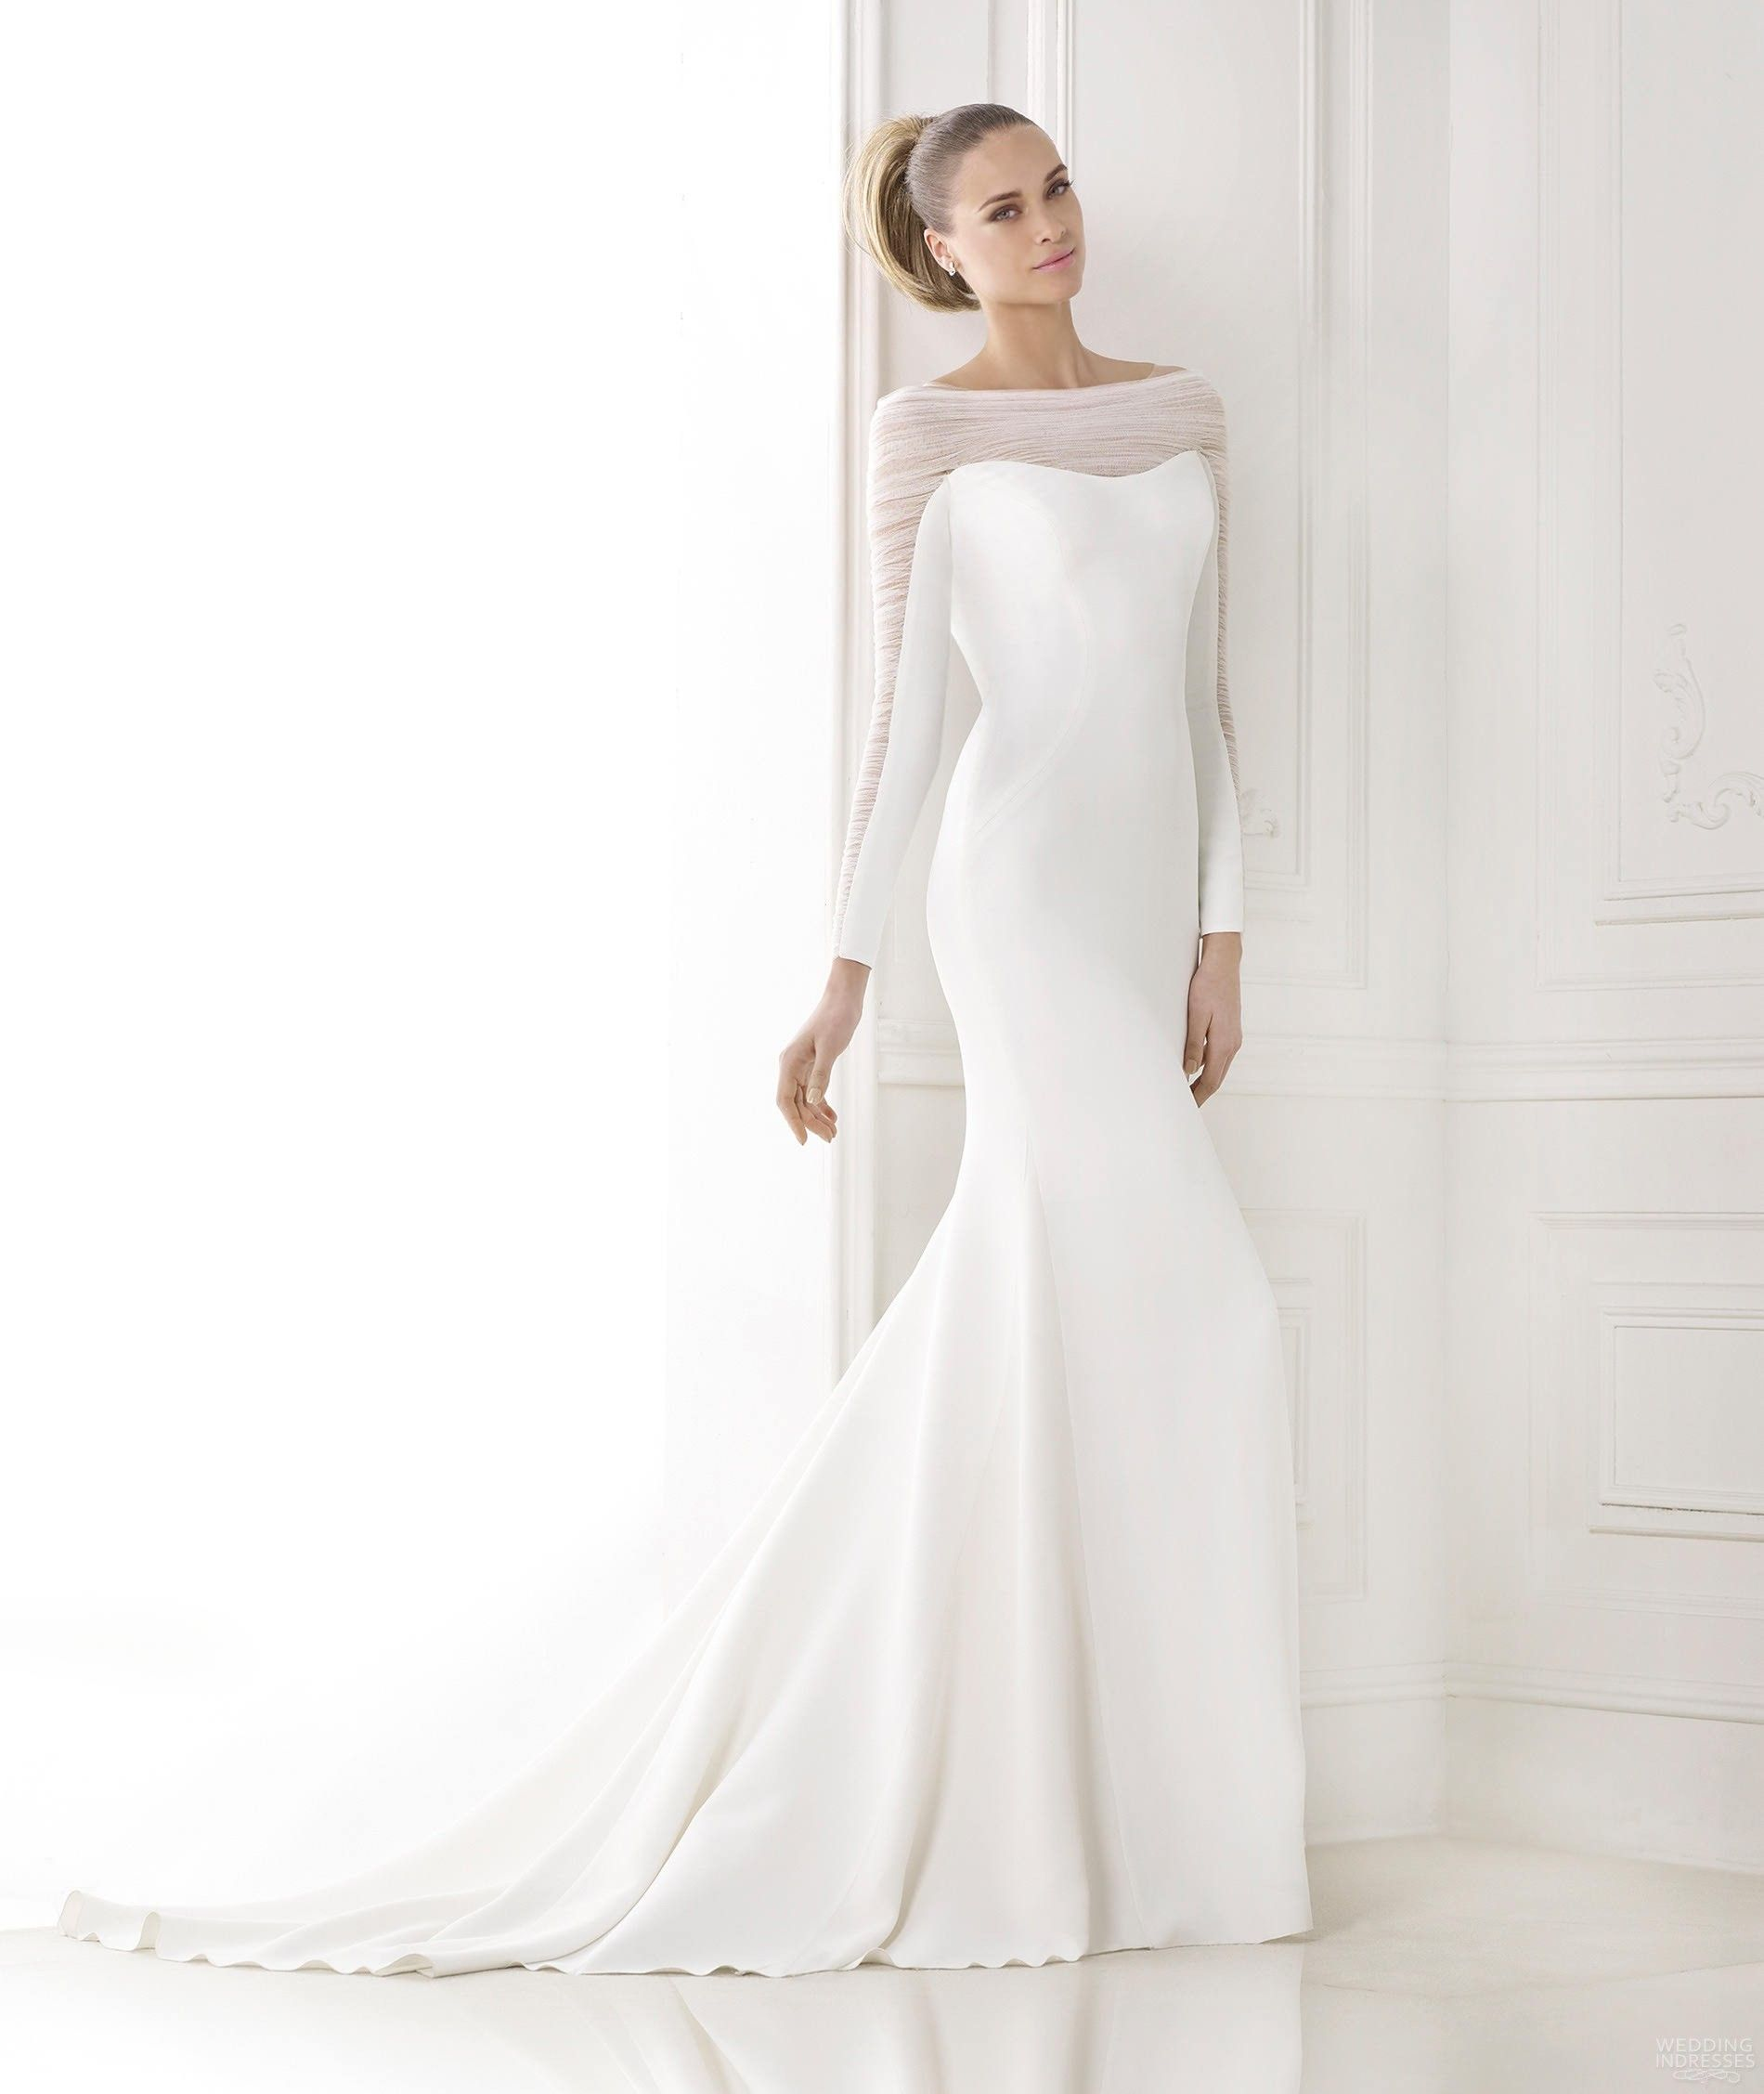 wedding dress long sleeve Long Sleeve Wedding Dresses Los Angeles and long sleeve wedding dresses birmingham